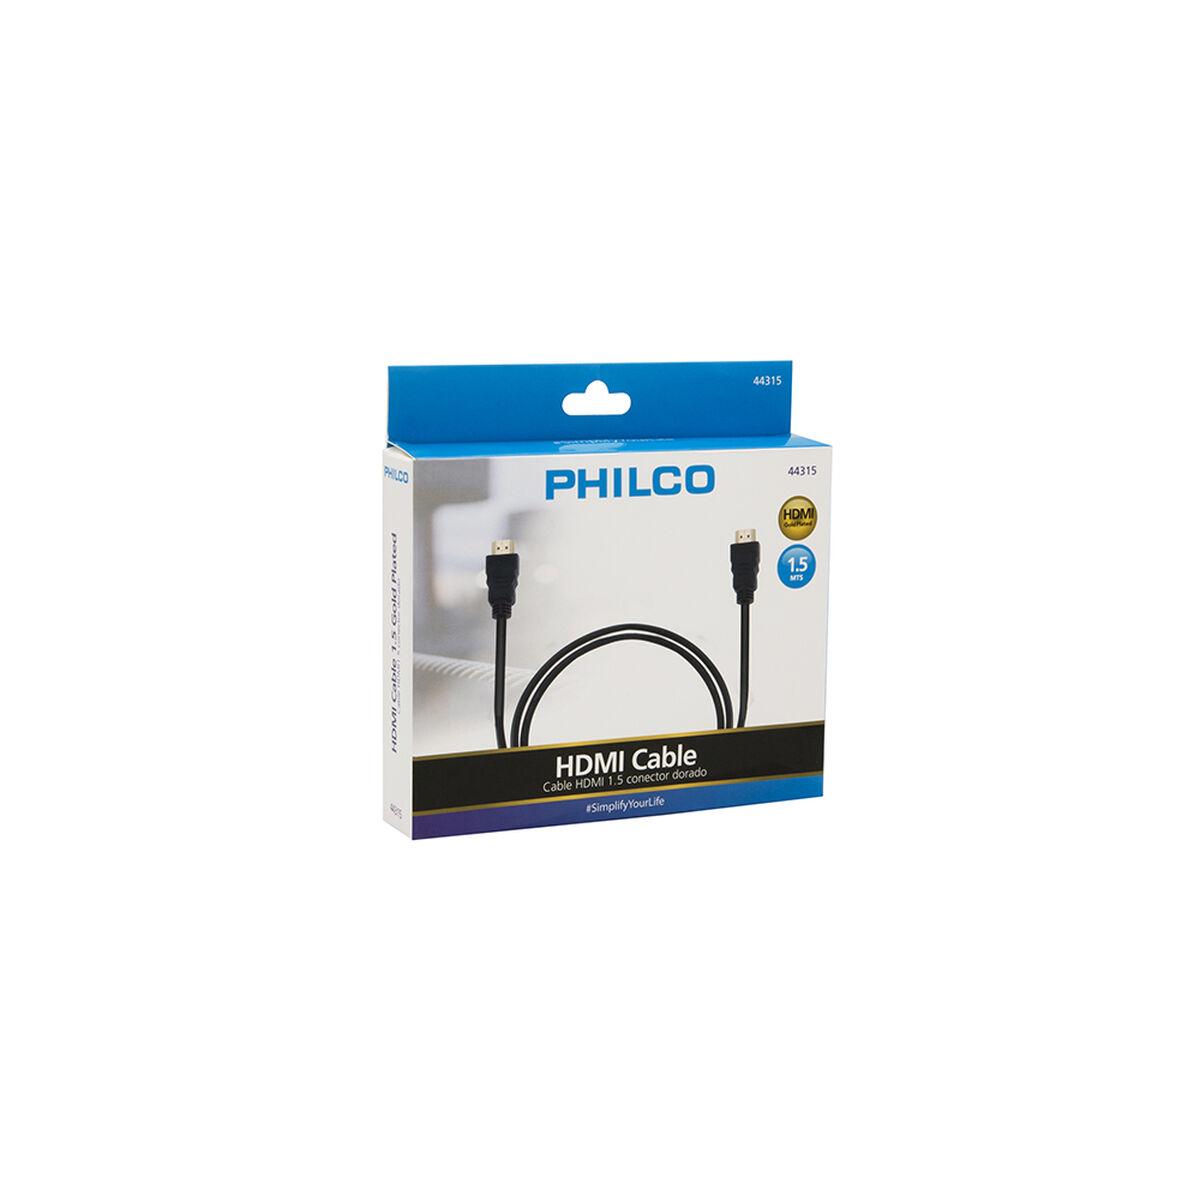 Cable HDMI Philco 31HDM44315 Gold 1,5 mts.